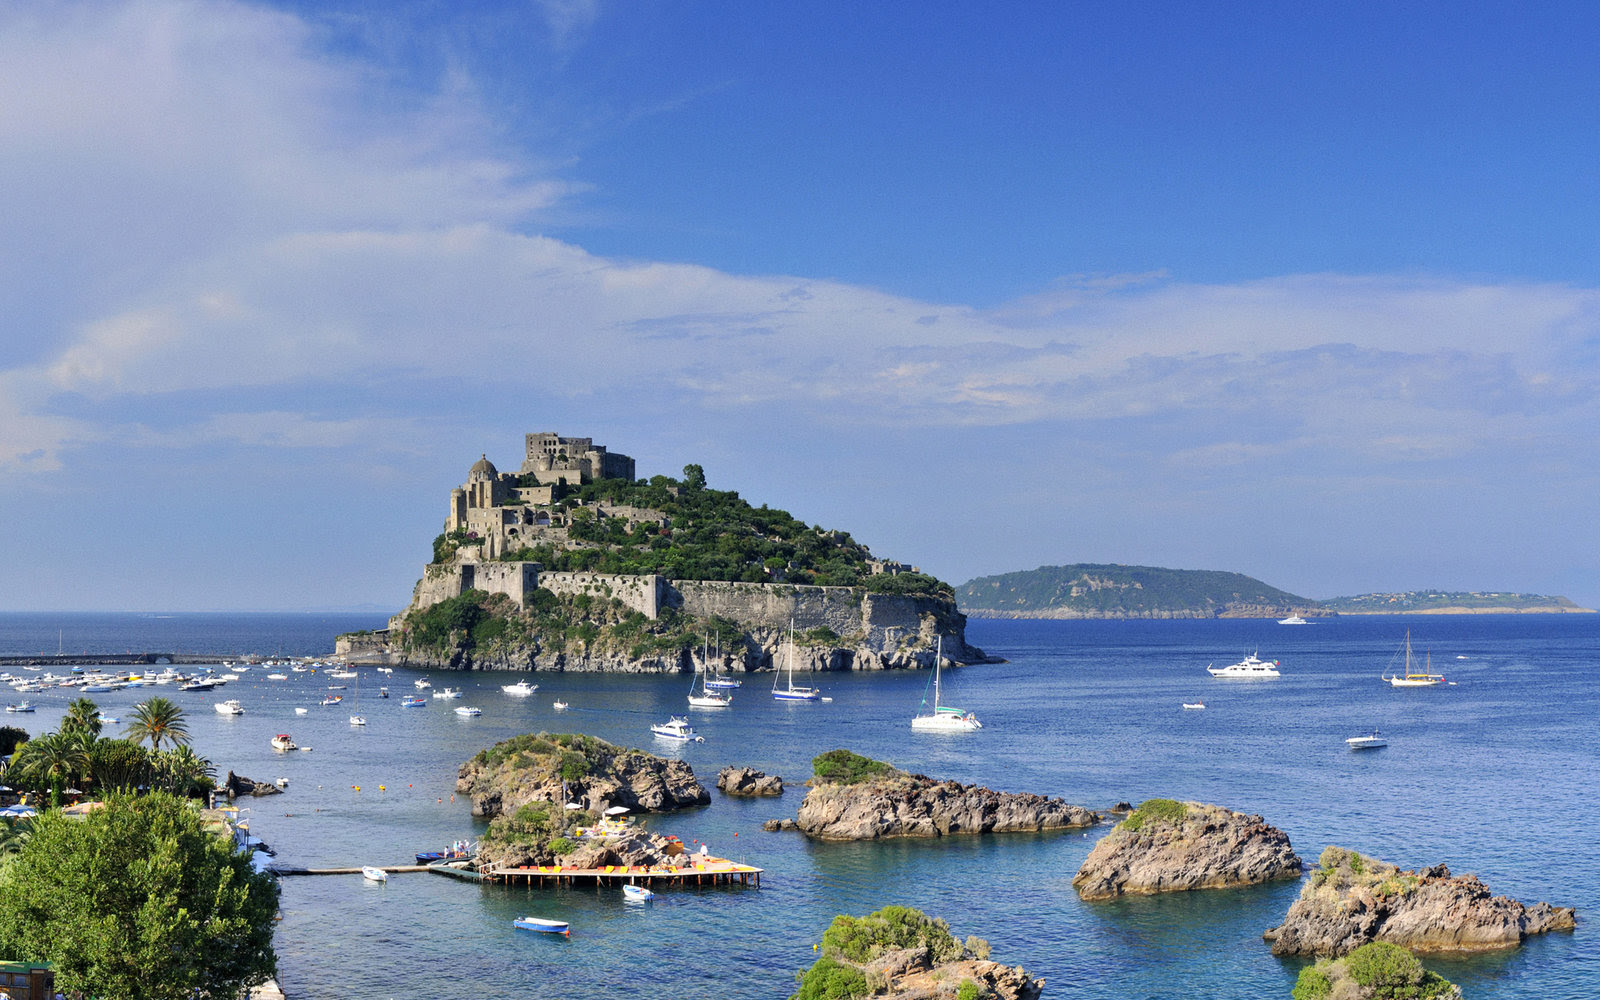 Aragonese castle in small fishing village Ischia Ponte, Ischia Island (thermal baths island), Napoli province, Mediterranean sea, Tyrrhenian sea, Campania, Italy